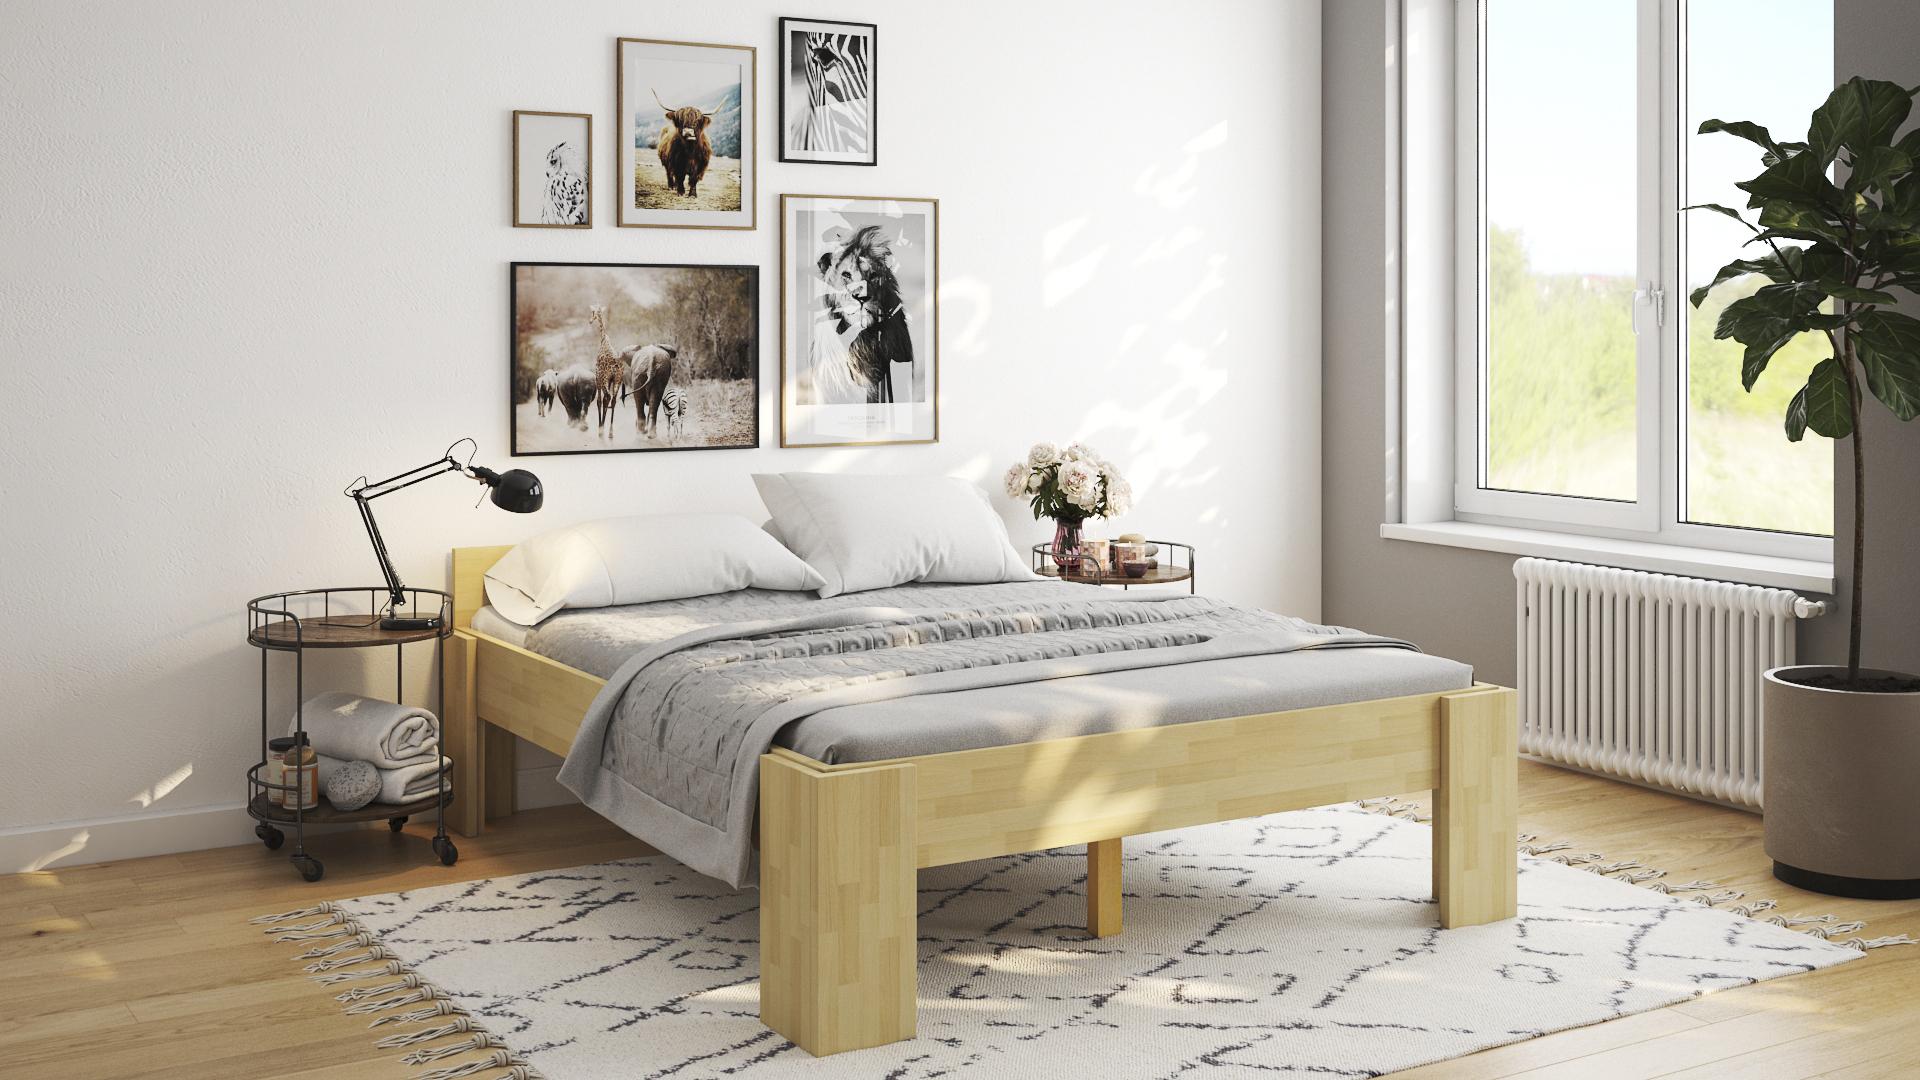 Full Size of Bett Ohne Füße Massivholzbetten Onlineshop Hochwertige Massivbetten Aus Massivholz Luxus Betten 180x200 Mädchen 160x200 Komplett Boxspring Paletten Kaufen Bett Bett Ohne Füße